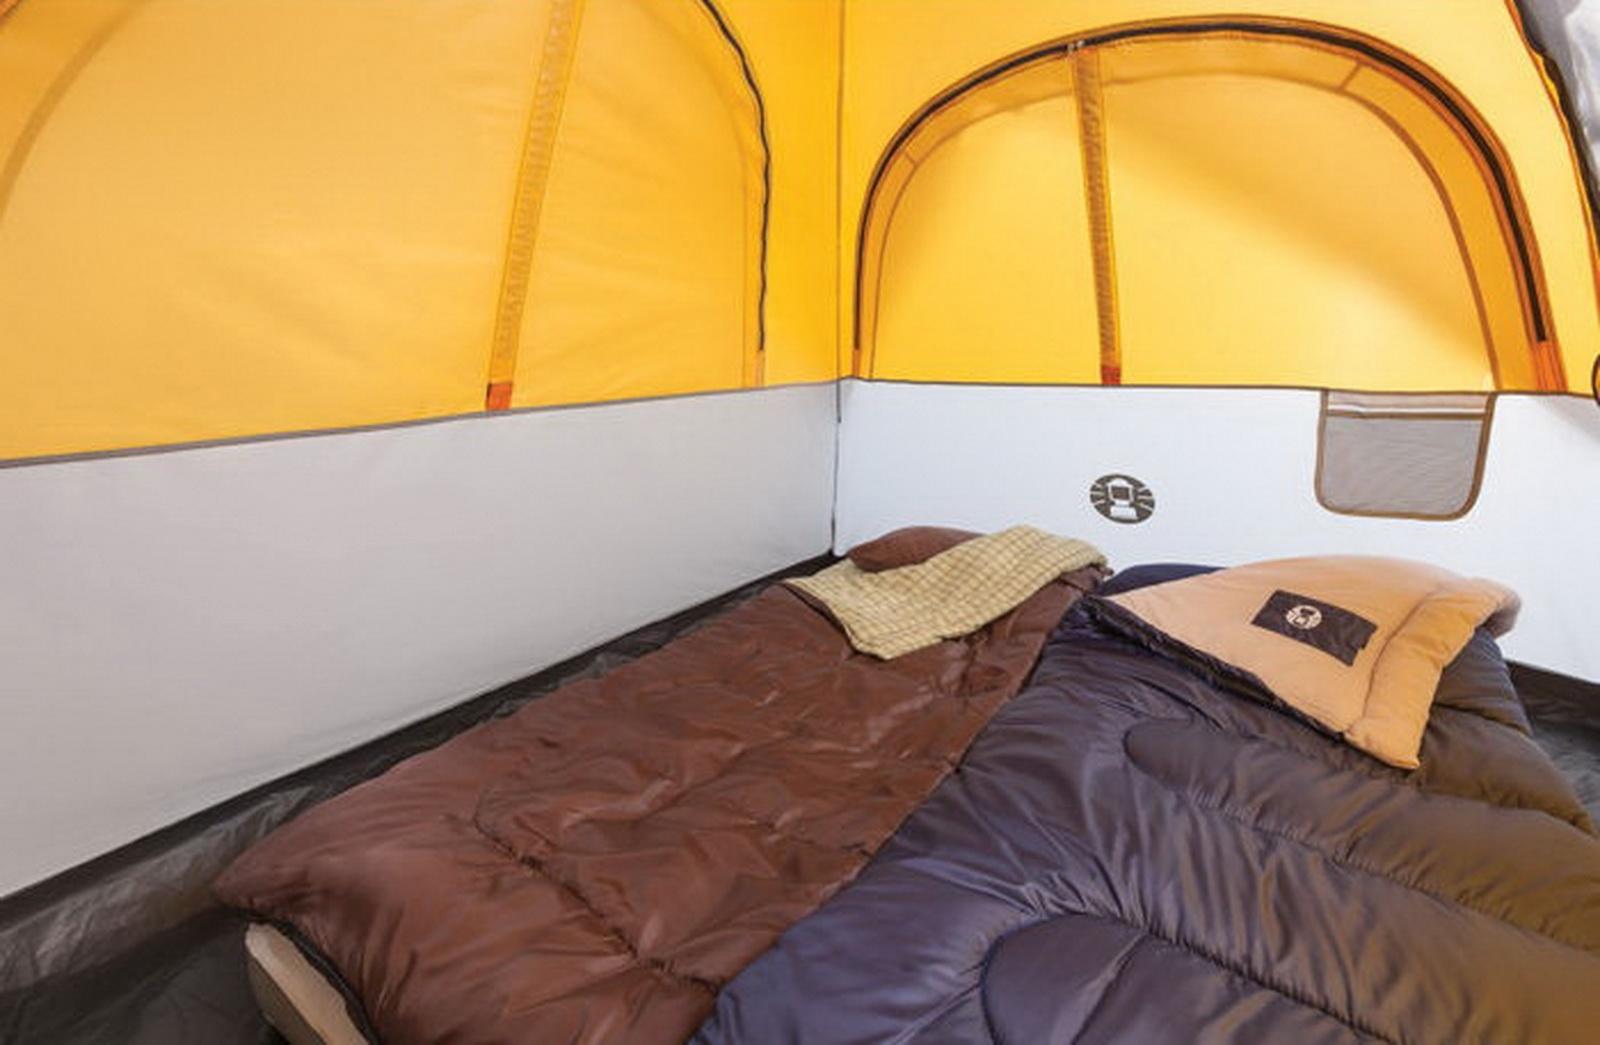 Free ... & Coleman 5 Person Tent 10u0027 x 7u0027 Weathermaster